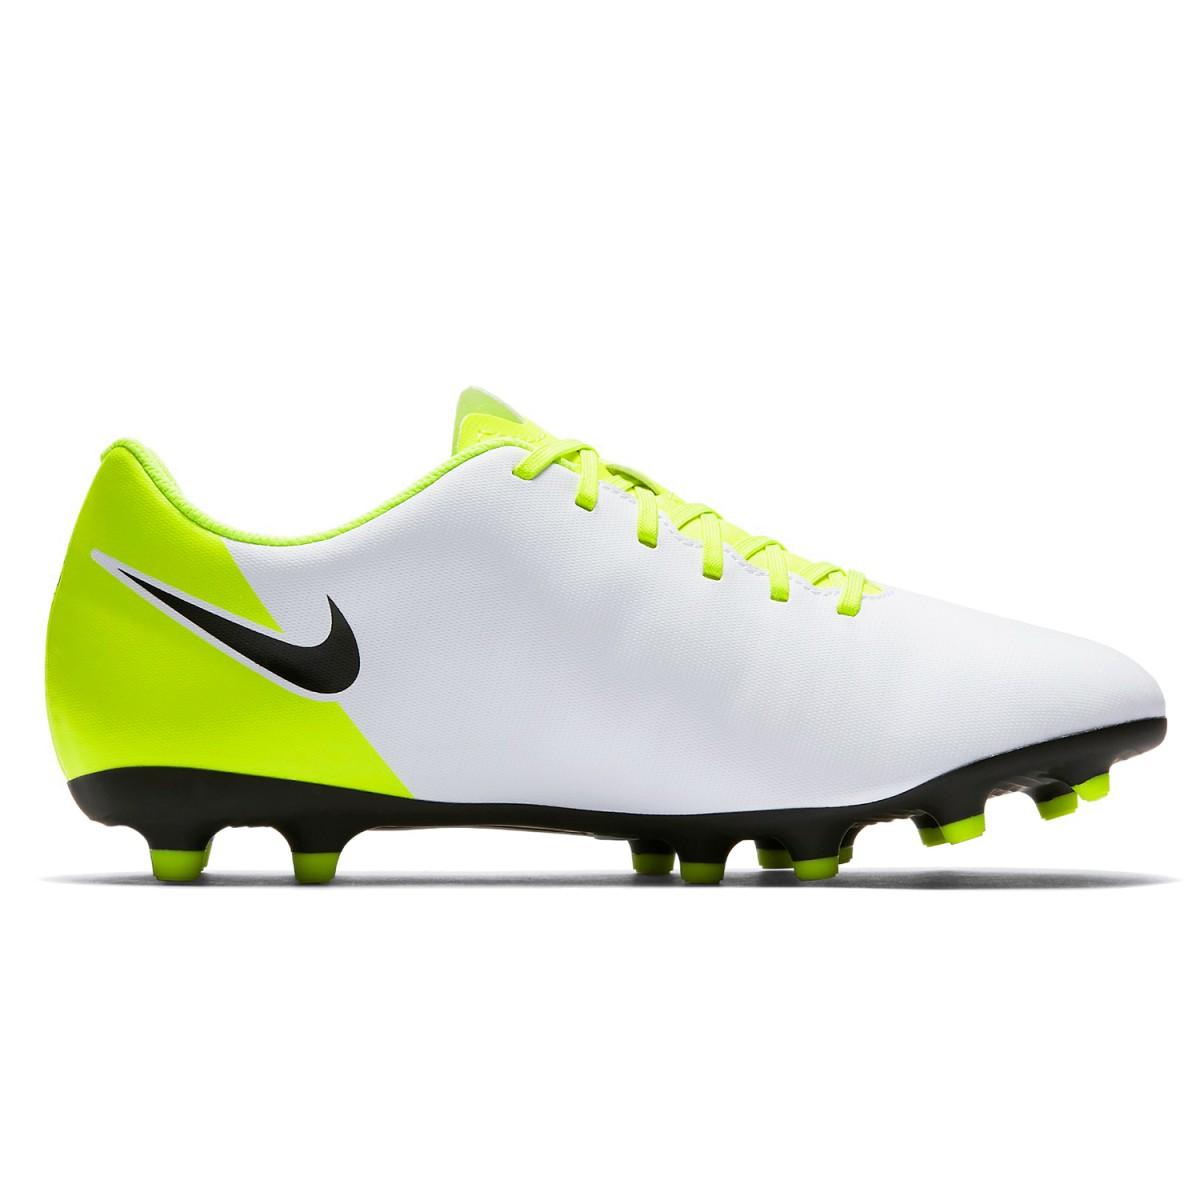 745c864d32 Bizz Store - Chuteira Futebol de Campo Nike Magista Ola II FG